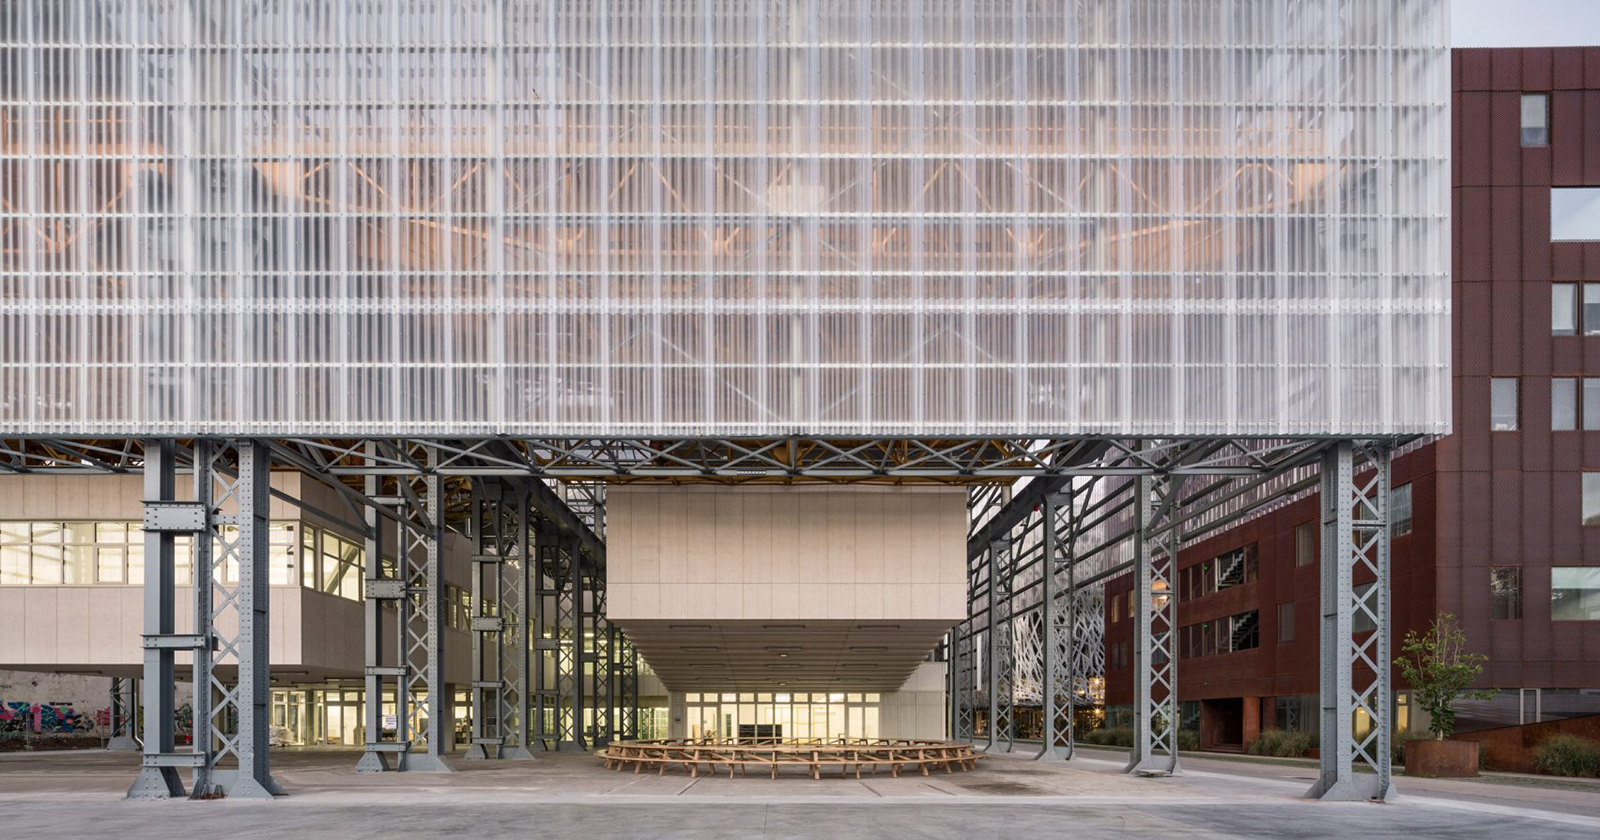 Adaptive reuse projects 2018: School of Arts, Nantes